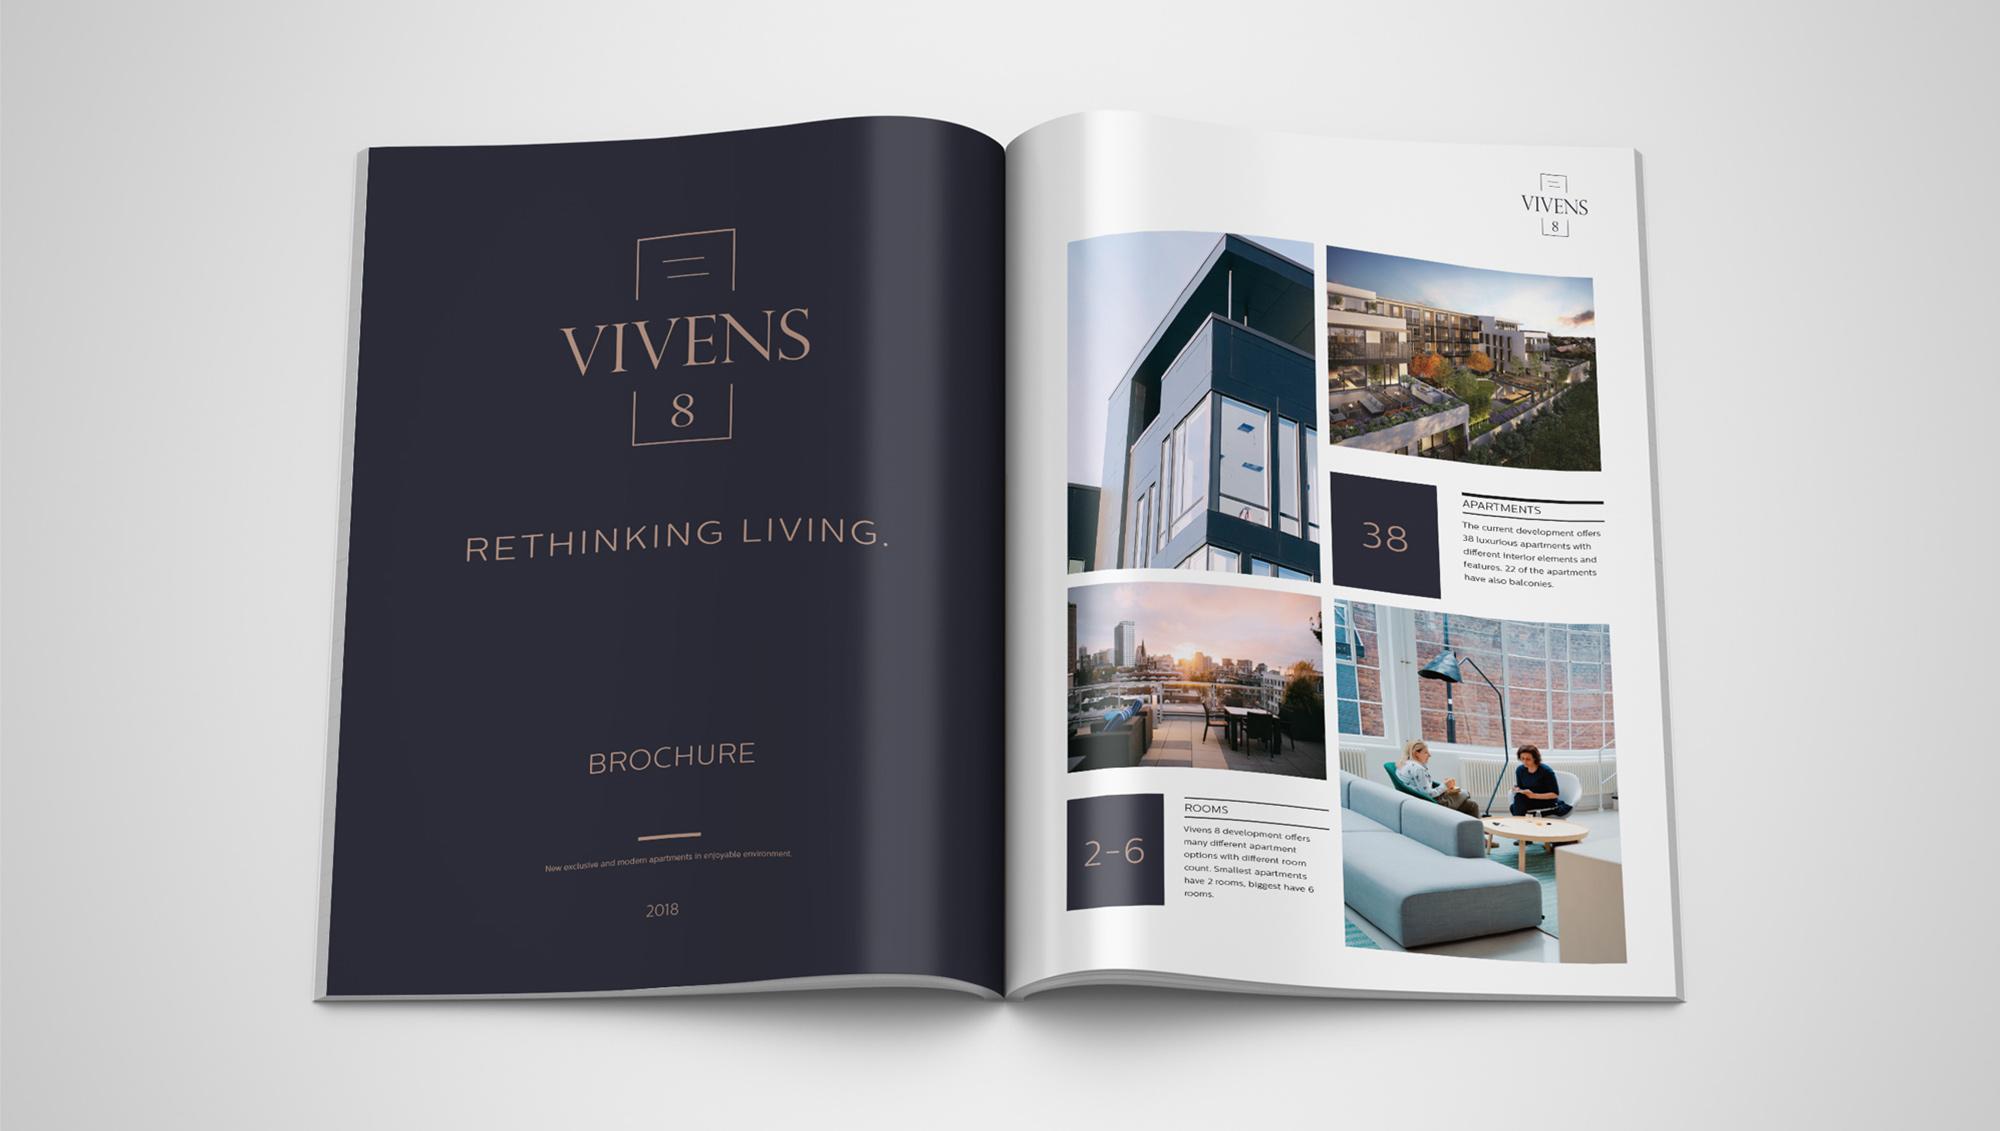 immobilien branding design real estate property development